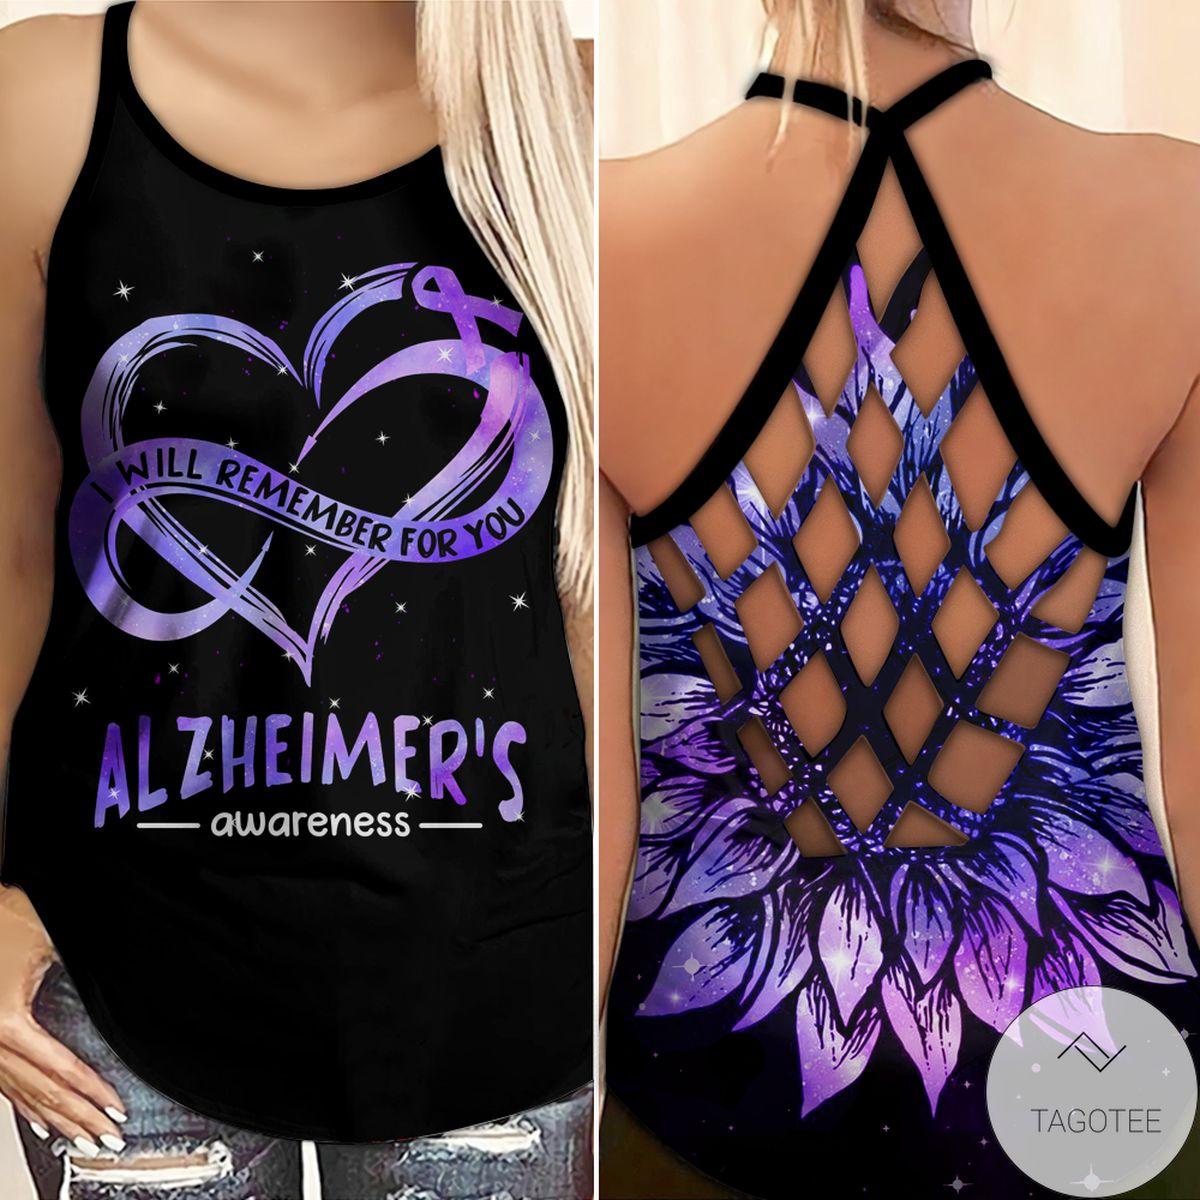 Alzheimer's Awareness I Will Remember For You Criss Cross Tank Top